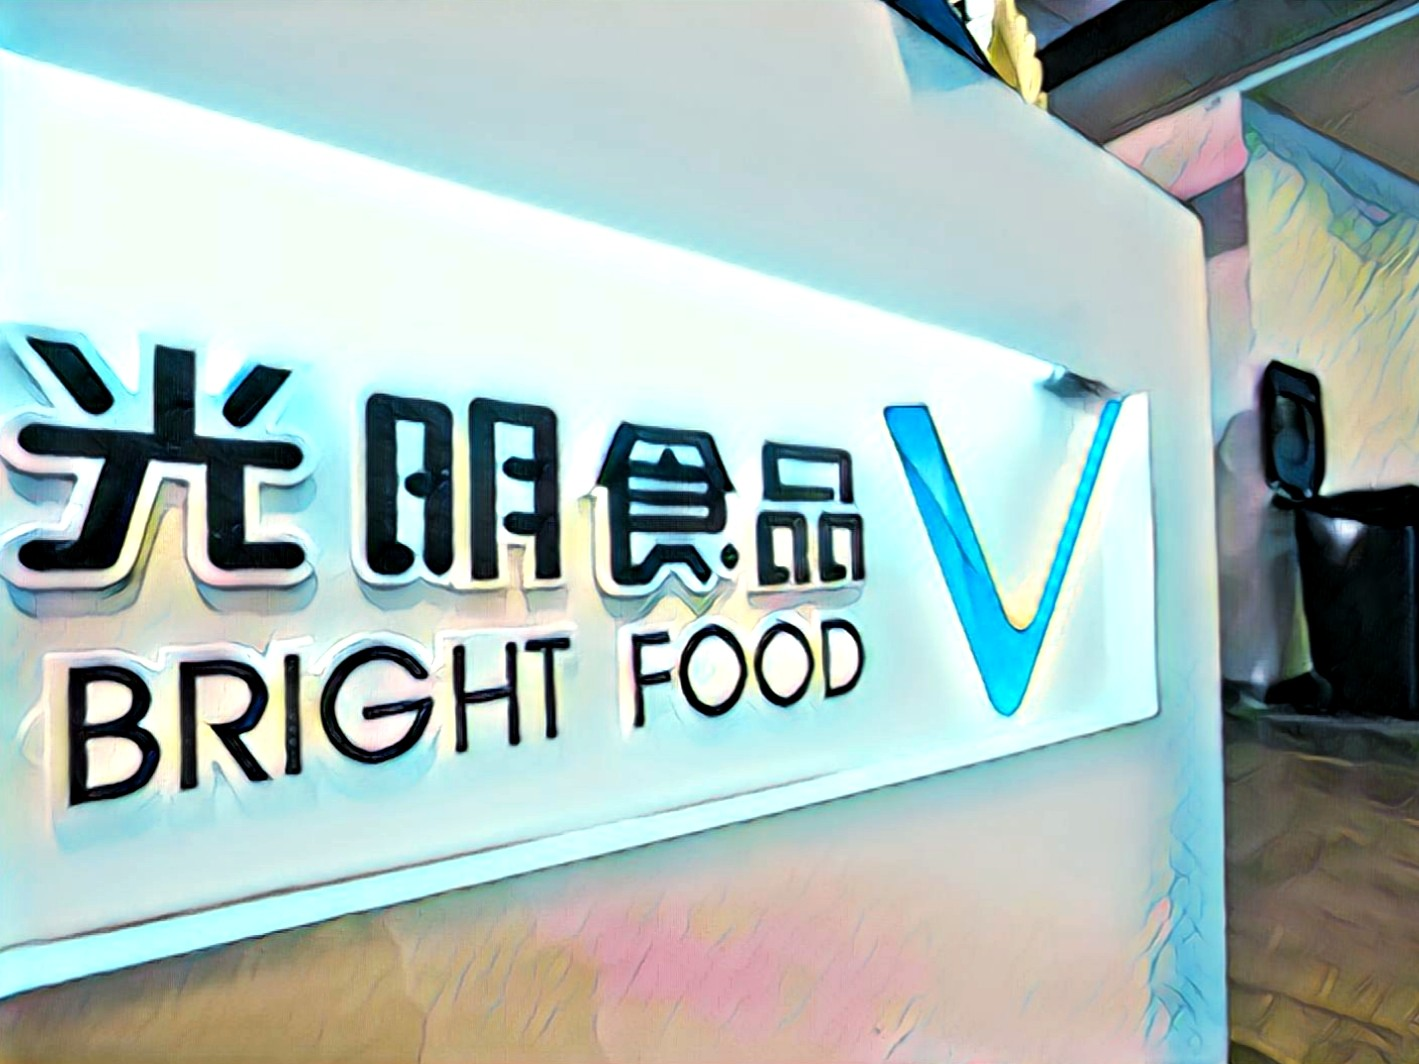 Cupid Farm Milk Bright Food VET VeChain